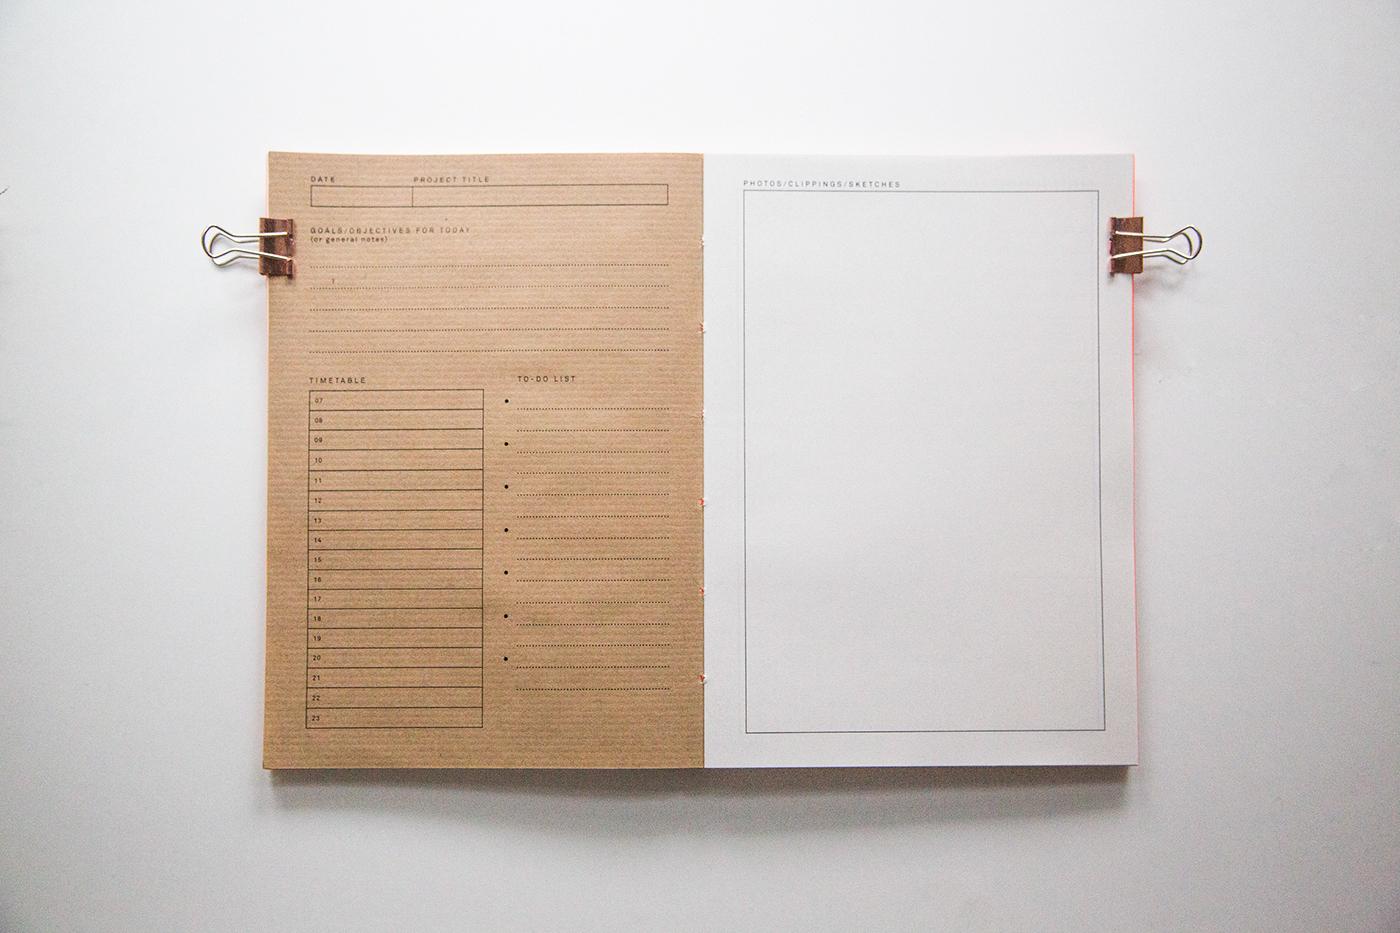 Diary book Bookbinding coptic coptic stitch design diary journal neon paper stock Kraft